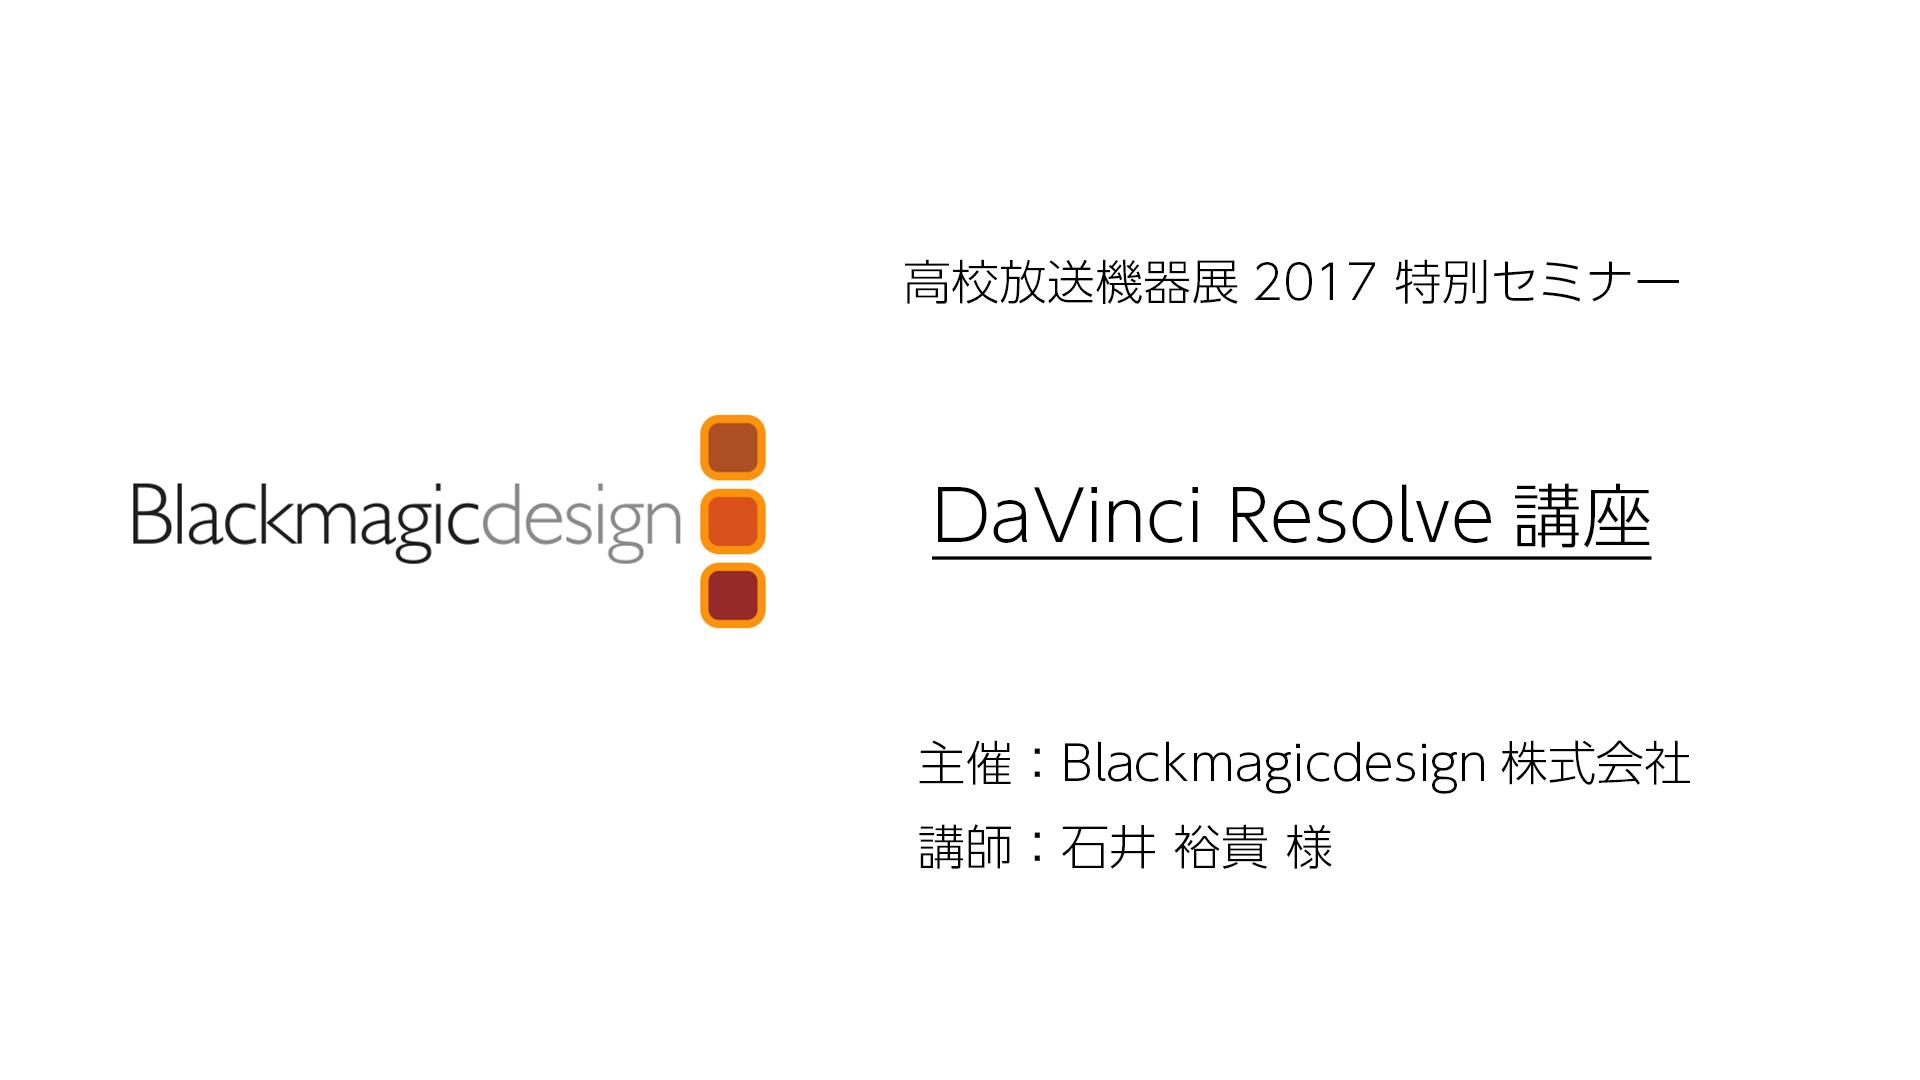 Blackmagicdesign DaVinci Resolve講座 in HSBEE2017の動画を公開しました!